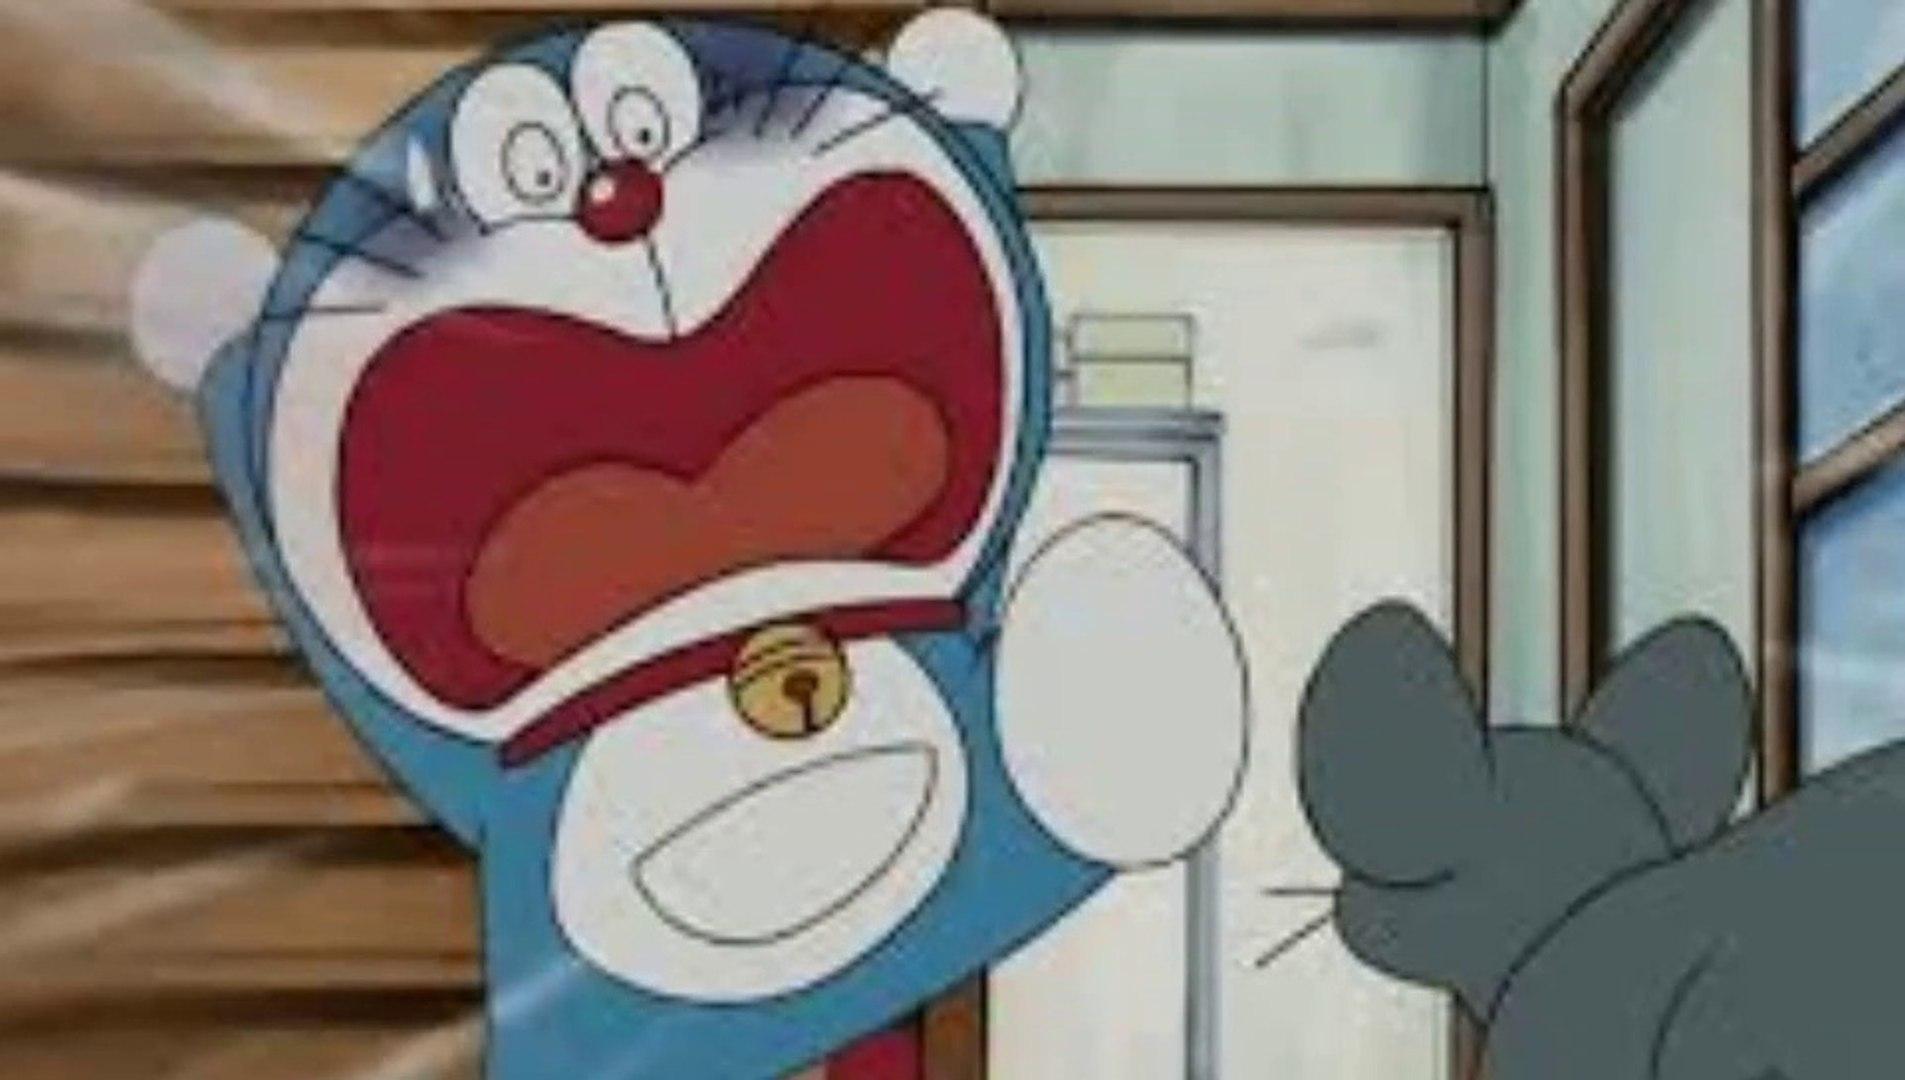 Doraemon Latest Episodes In Hindi 2019 Doraemon New Episodes In Hindi Of 2020 Video Dailymotion